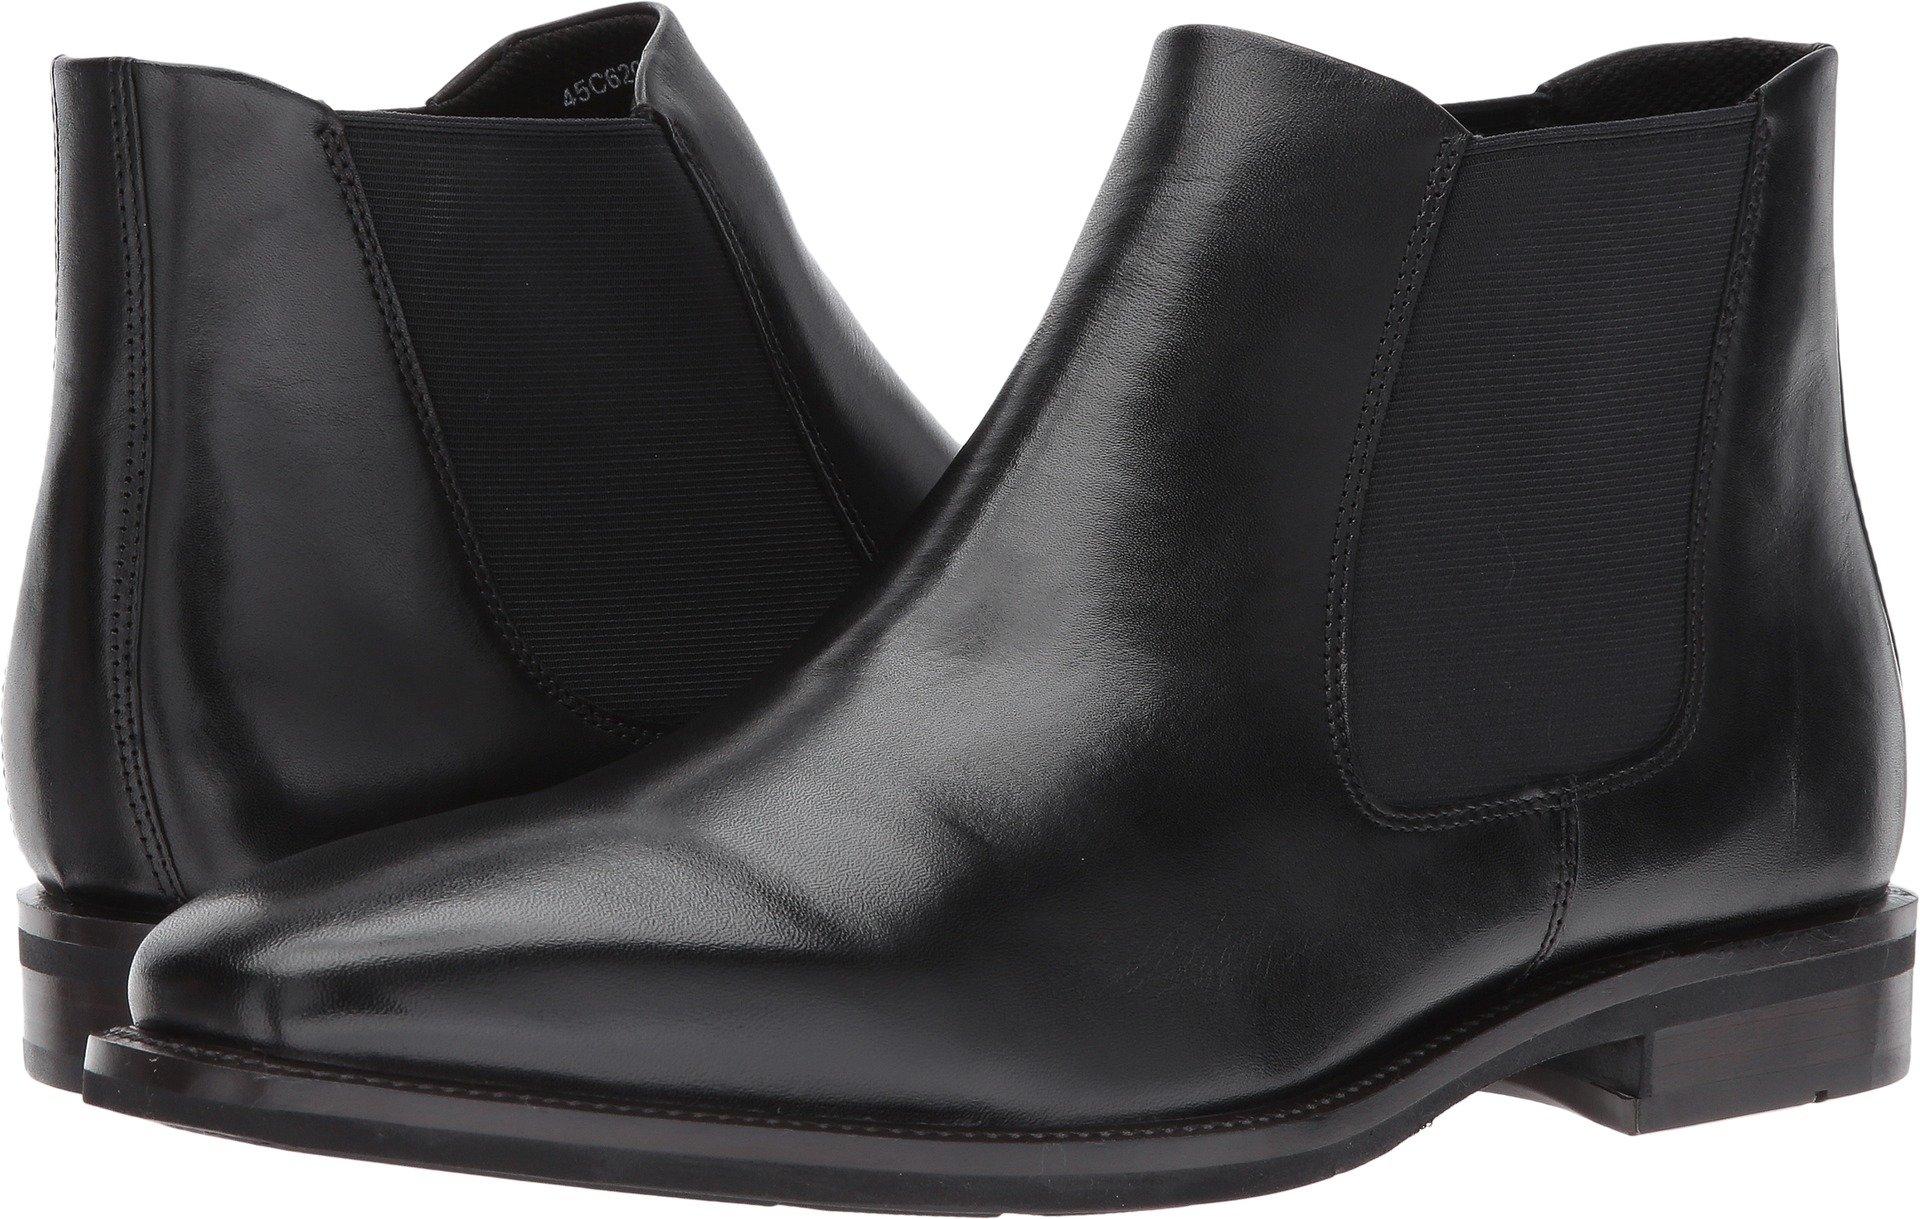 ECCO Men's Faro Plain Toe Chelsea Boot, Black, 45 EU/11.5-12 M US